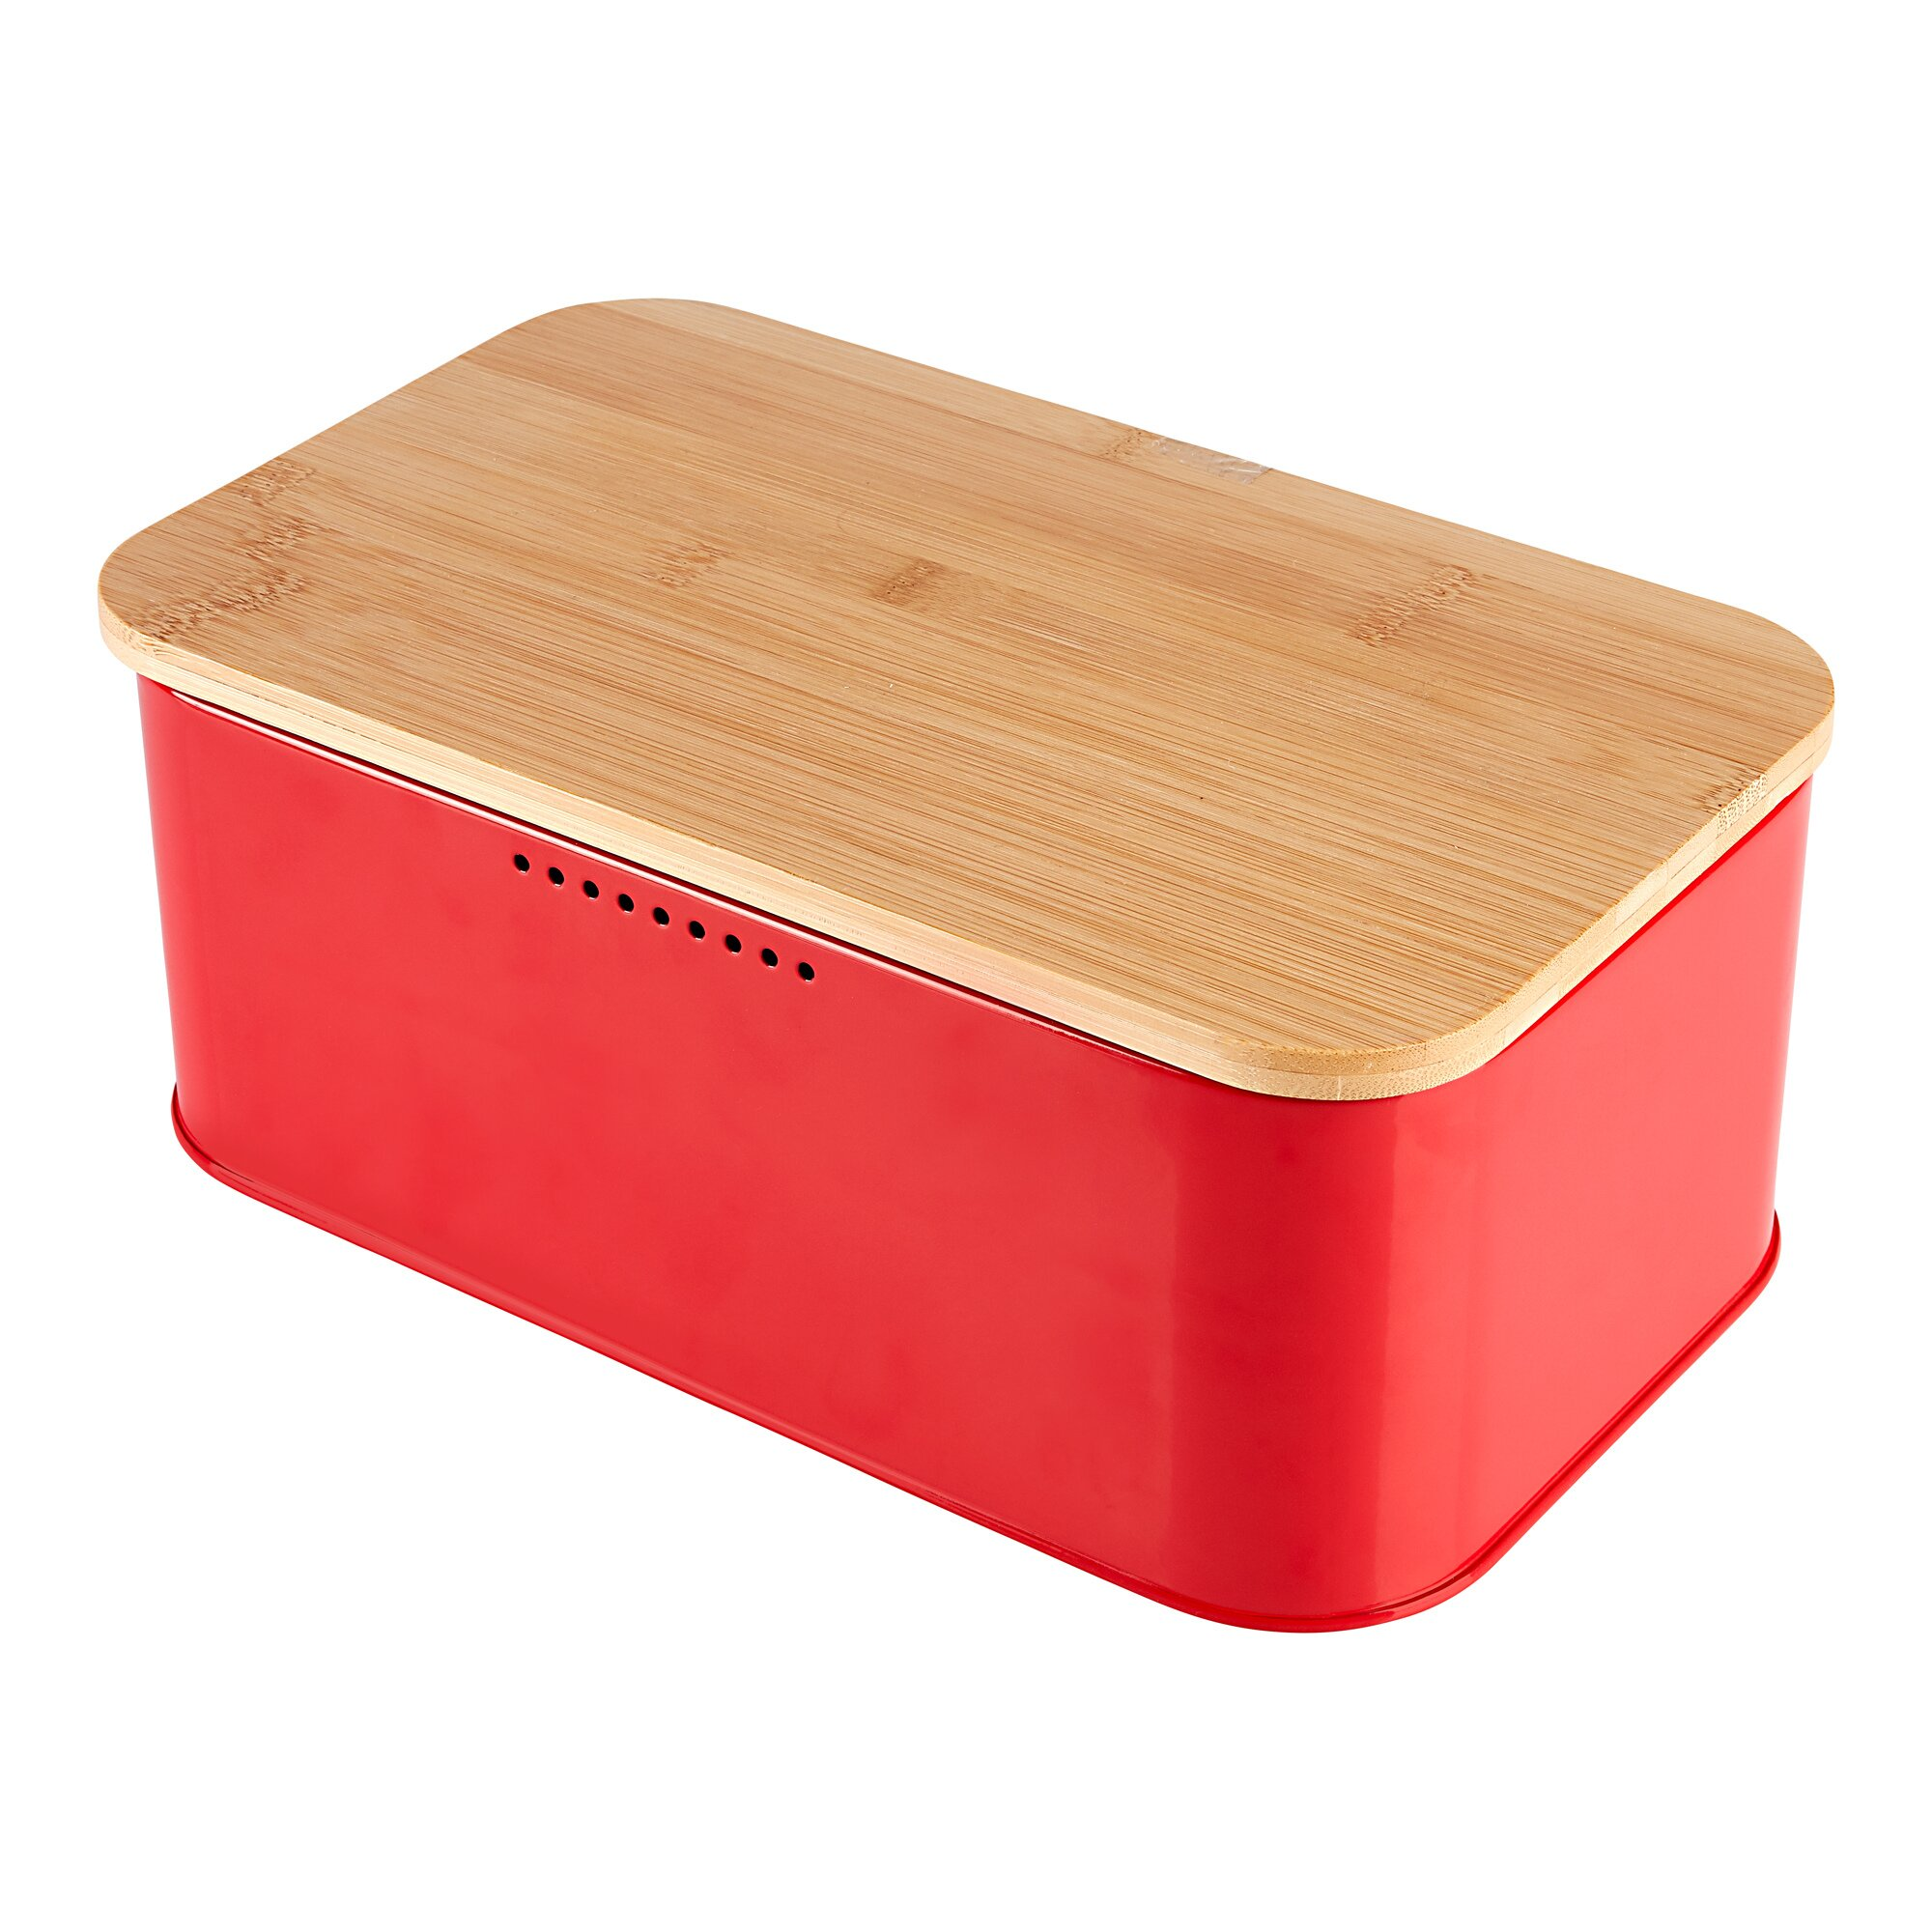 Image of genialo® Brotbox mit Bambusdeckel